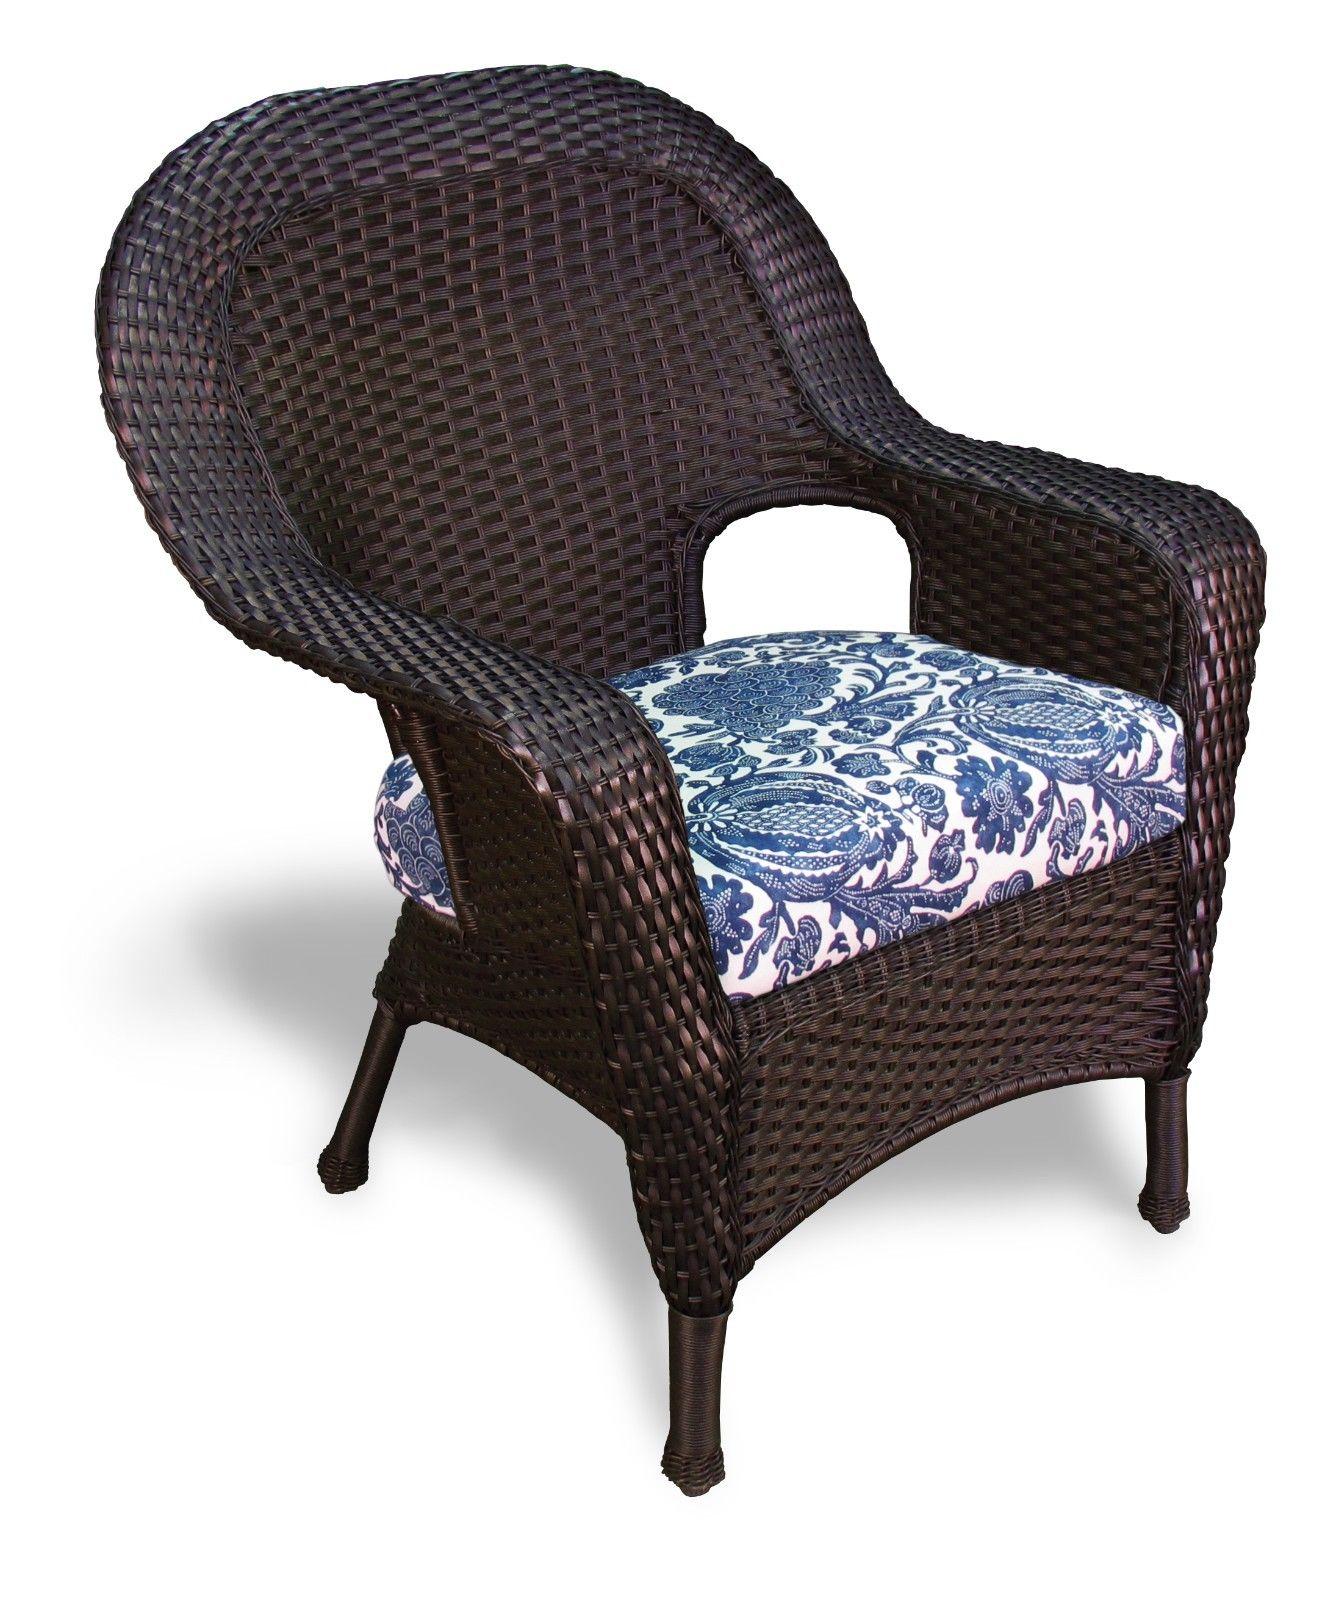 #142 - Outdoor Patio Garden Furniture Tortoise Resin Wicker Dining Chair in Inoteka Indigo